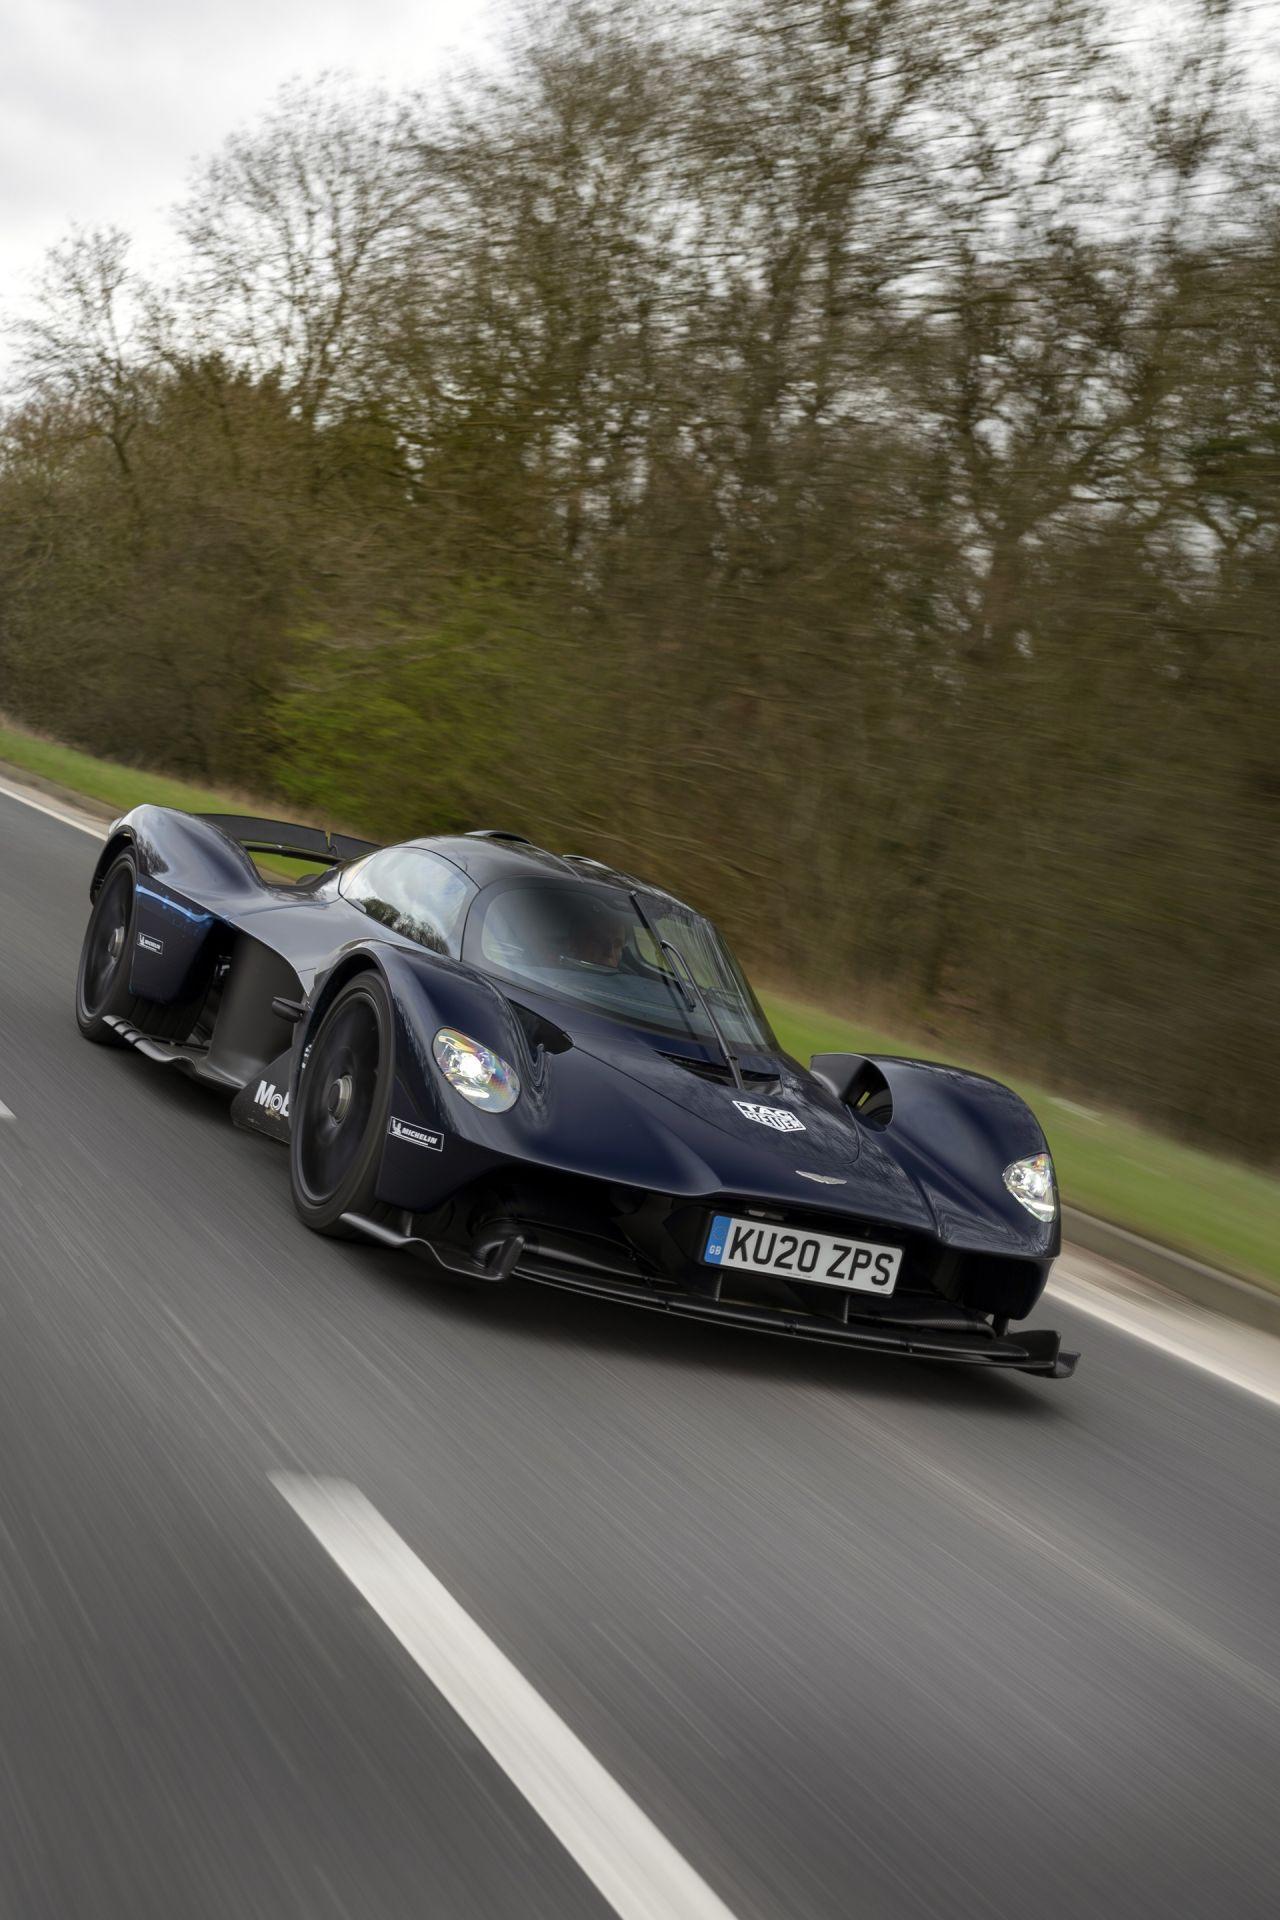 Aston_Martin_Valkyrie_public_roads_0008